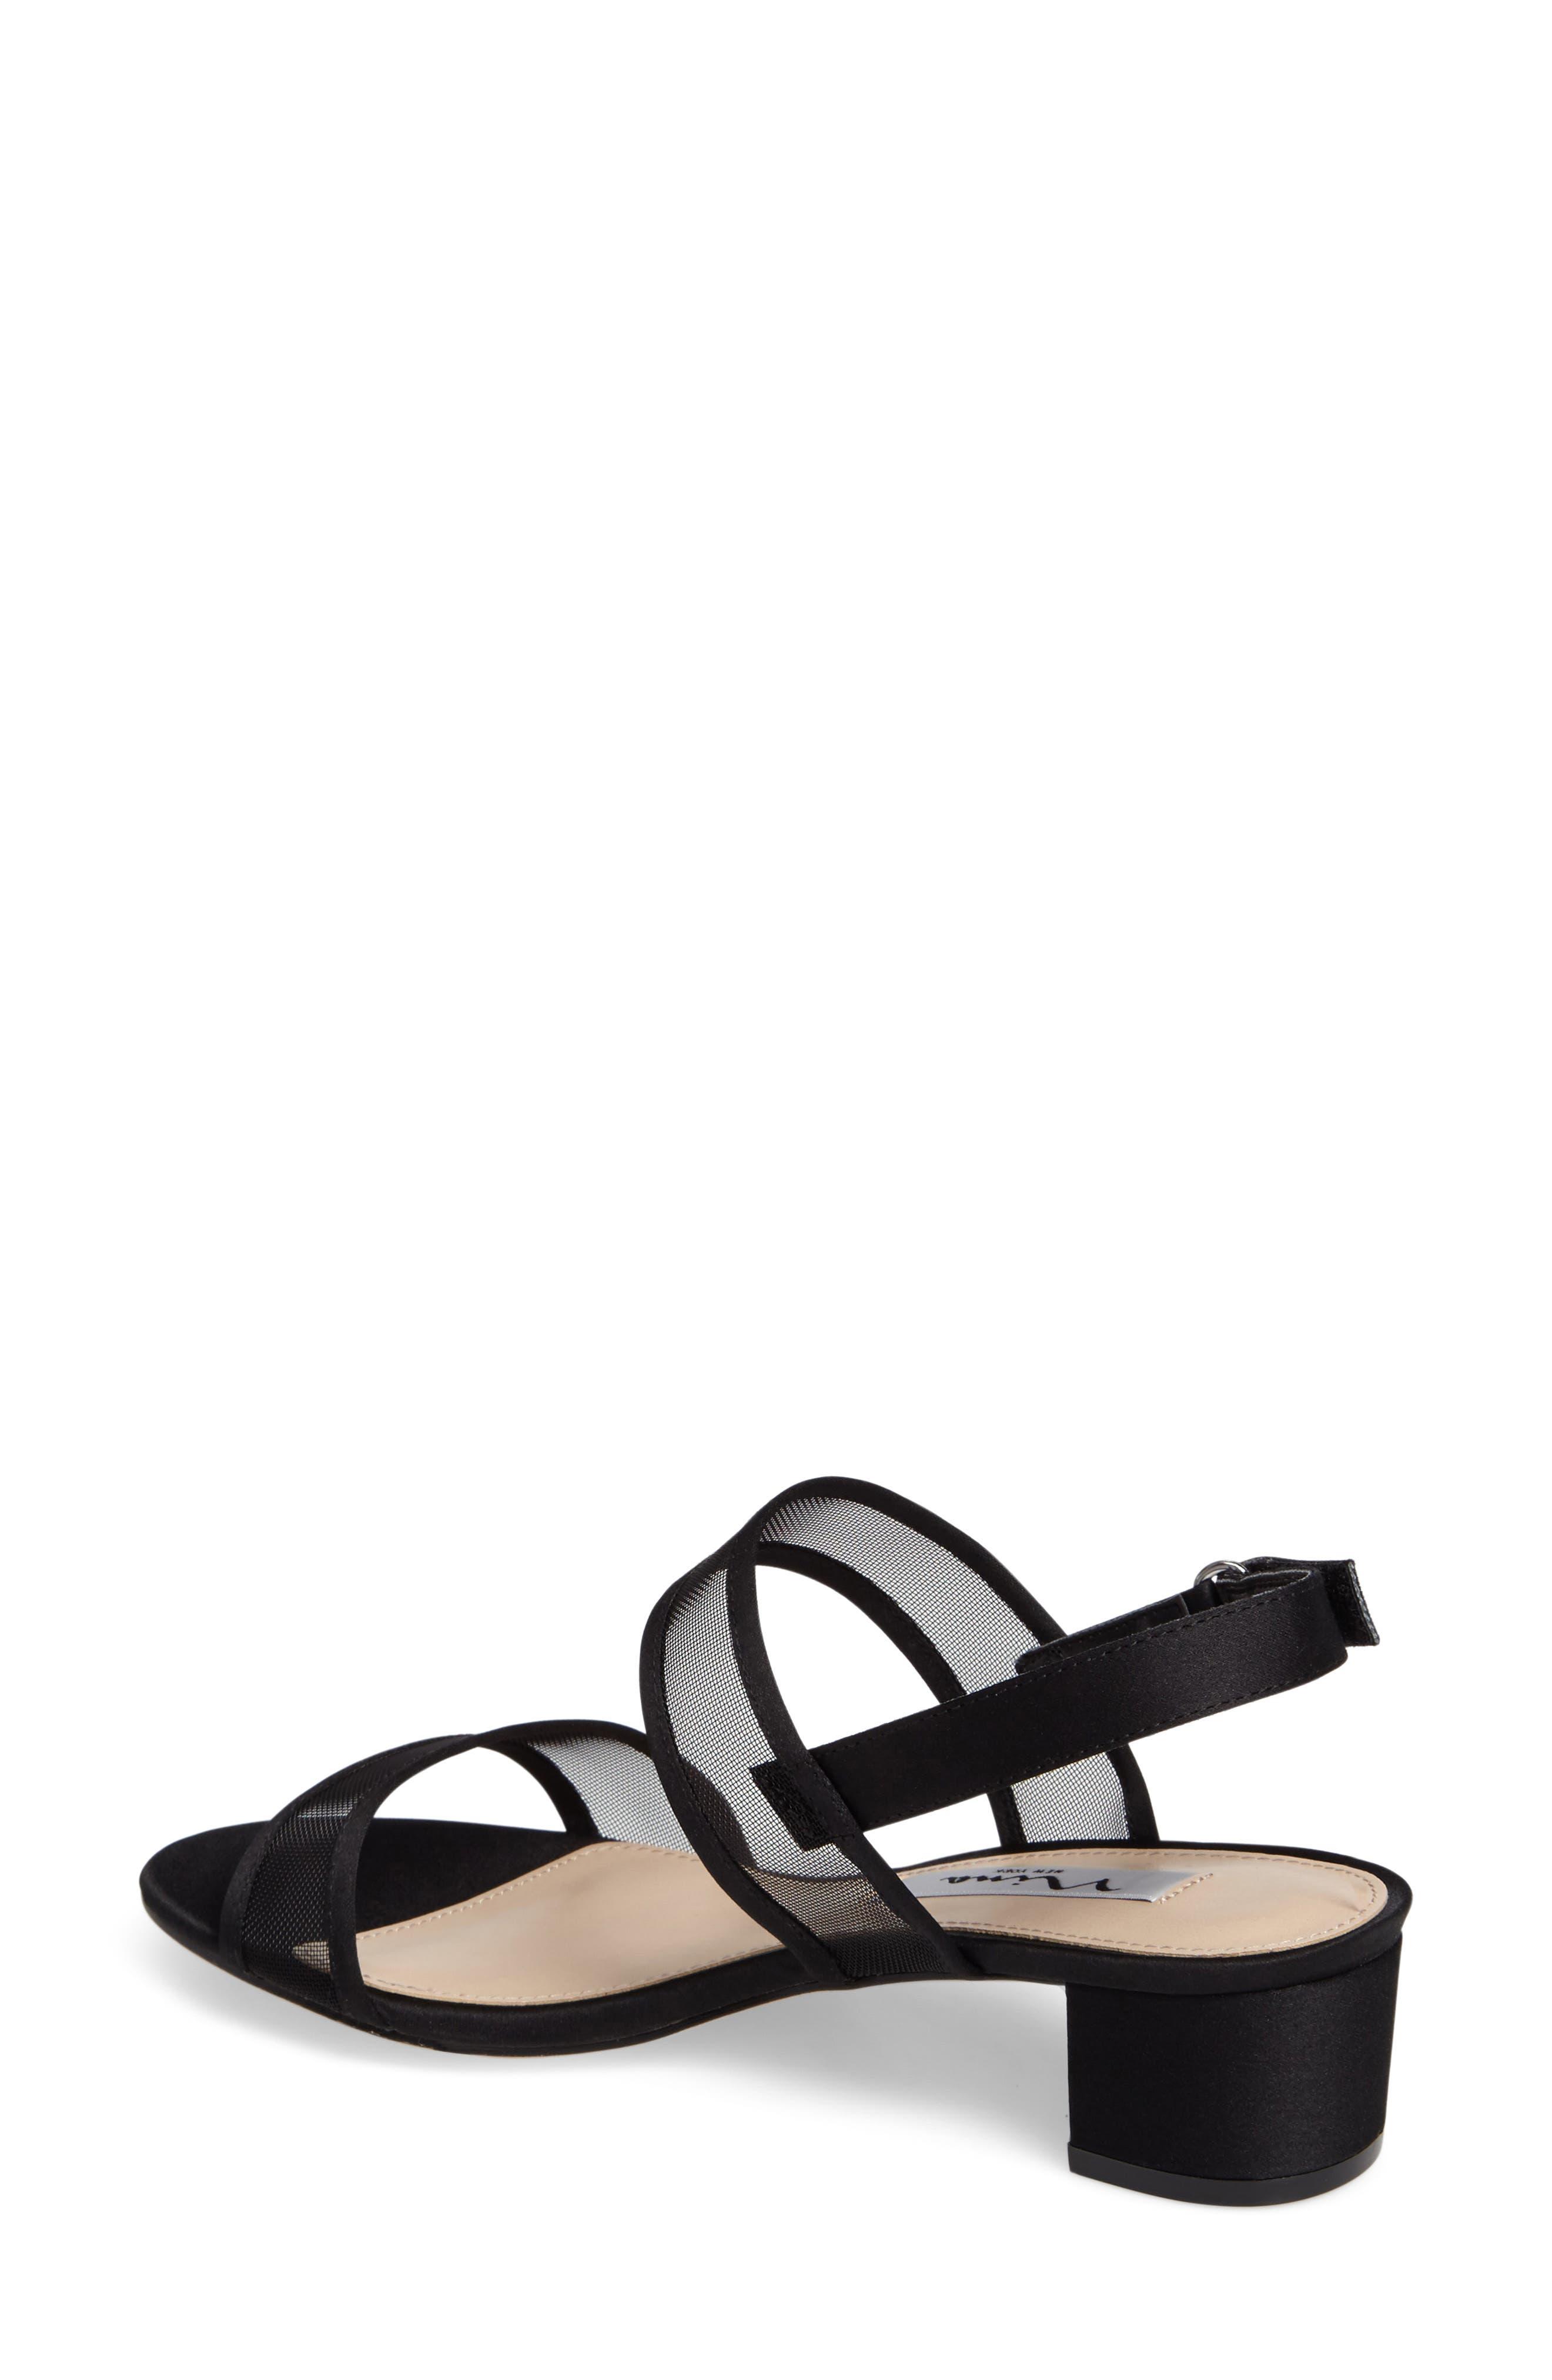 NINA, Ganice Mesh Strap Sandal, Alternate thumbnail 2, color, BLACK SATIN